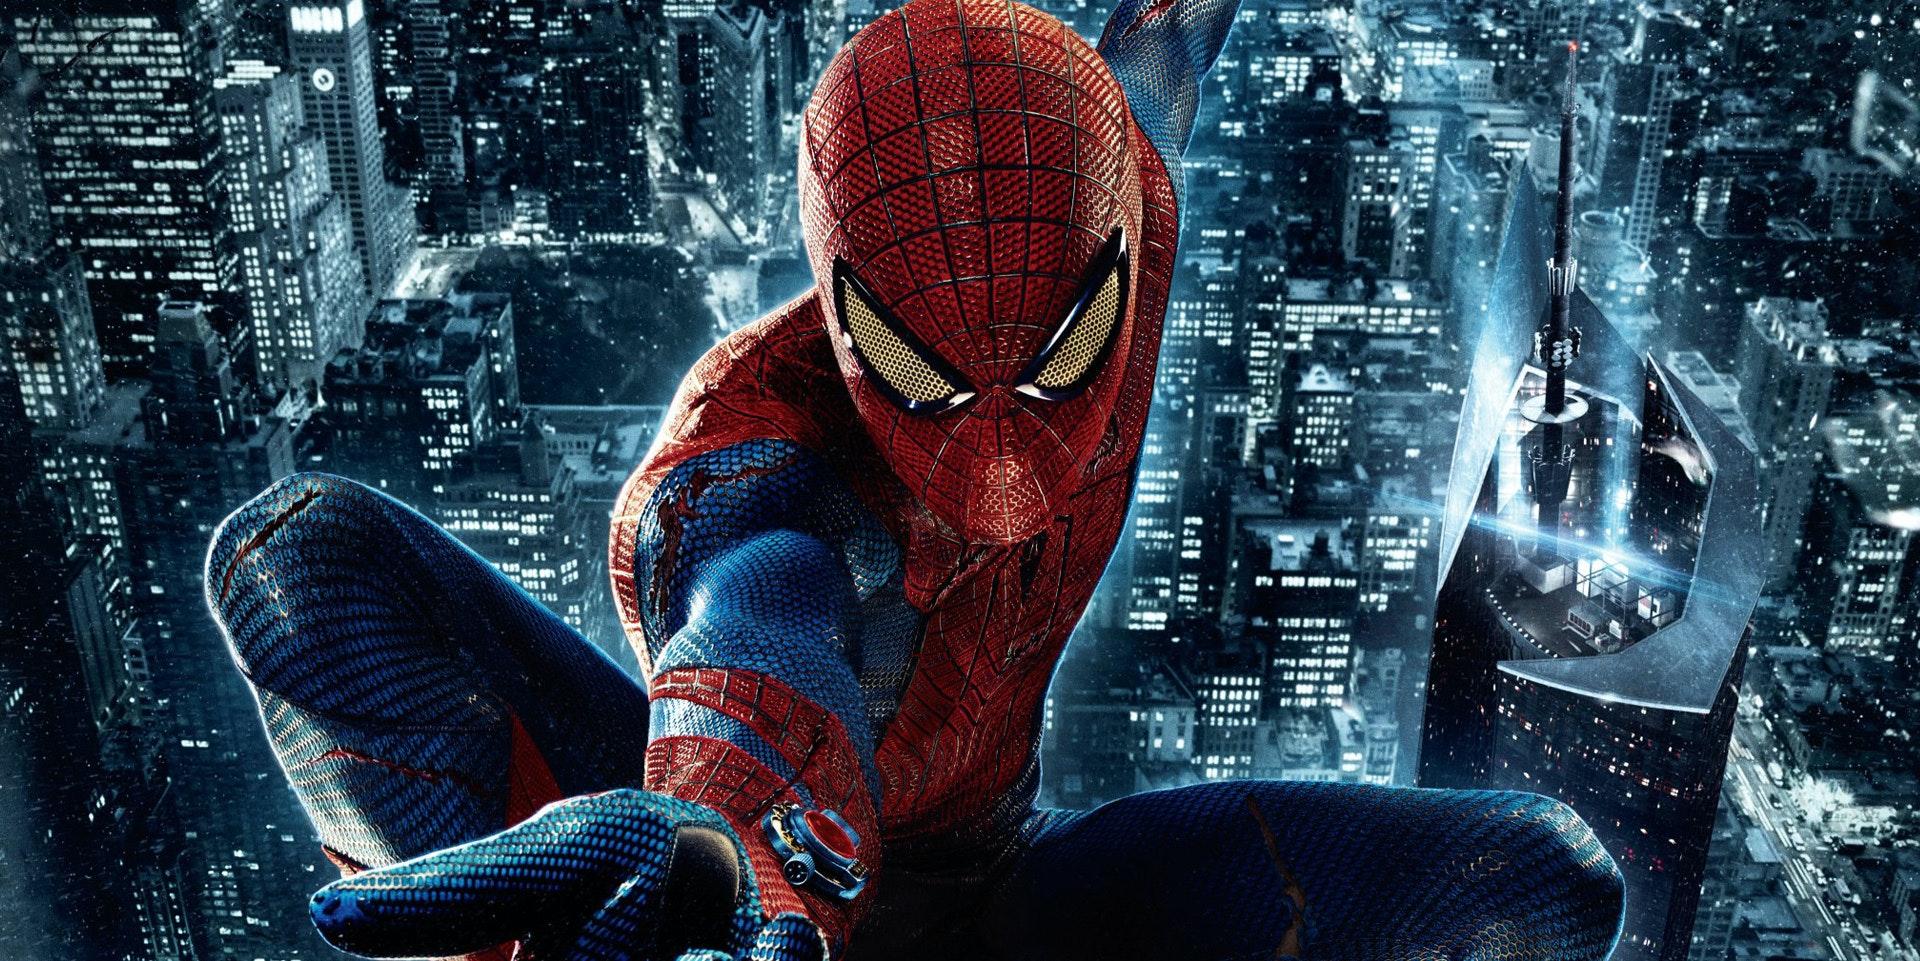 How 'Jessica Jones' Bodes Well for Marvel's Spider-Man Movie